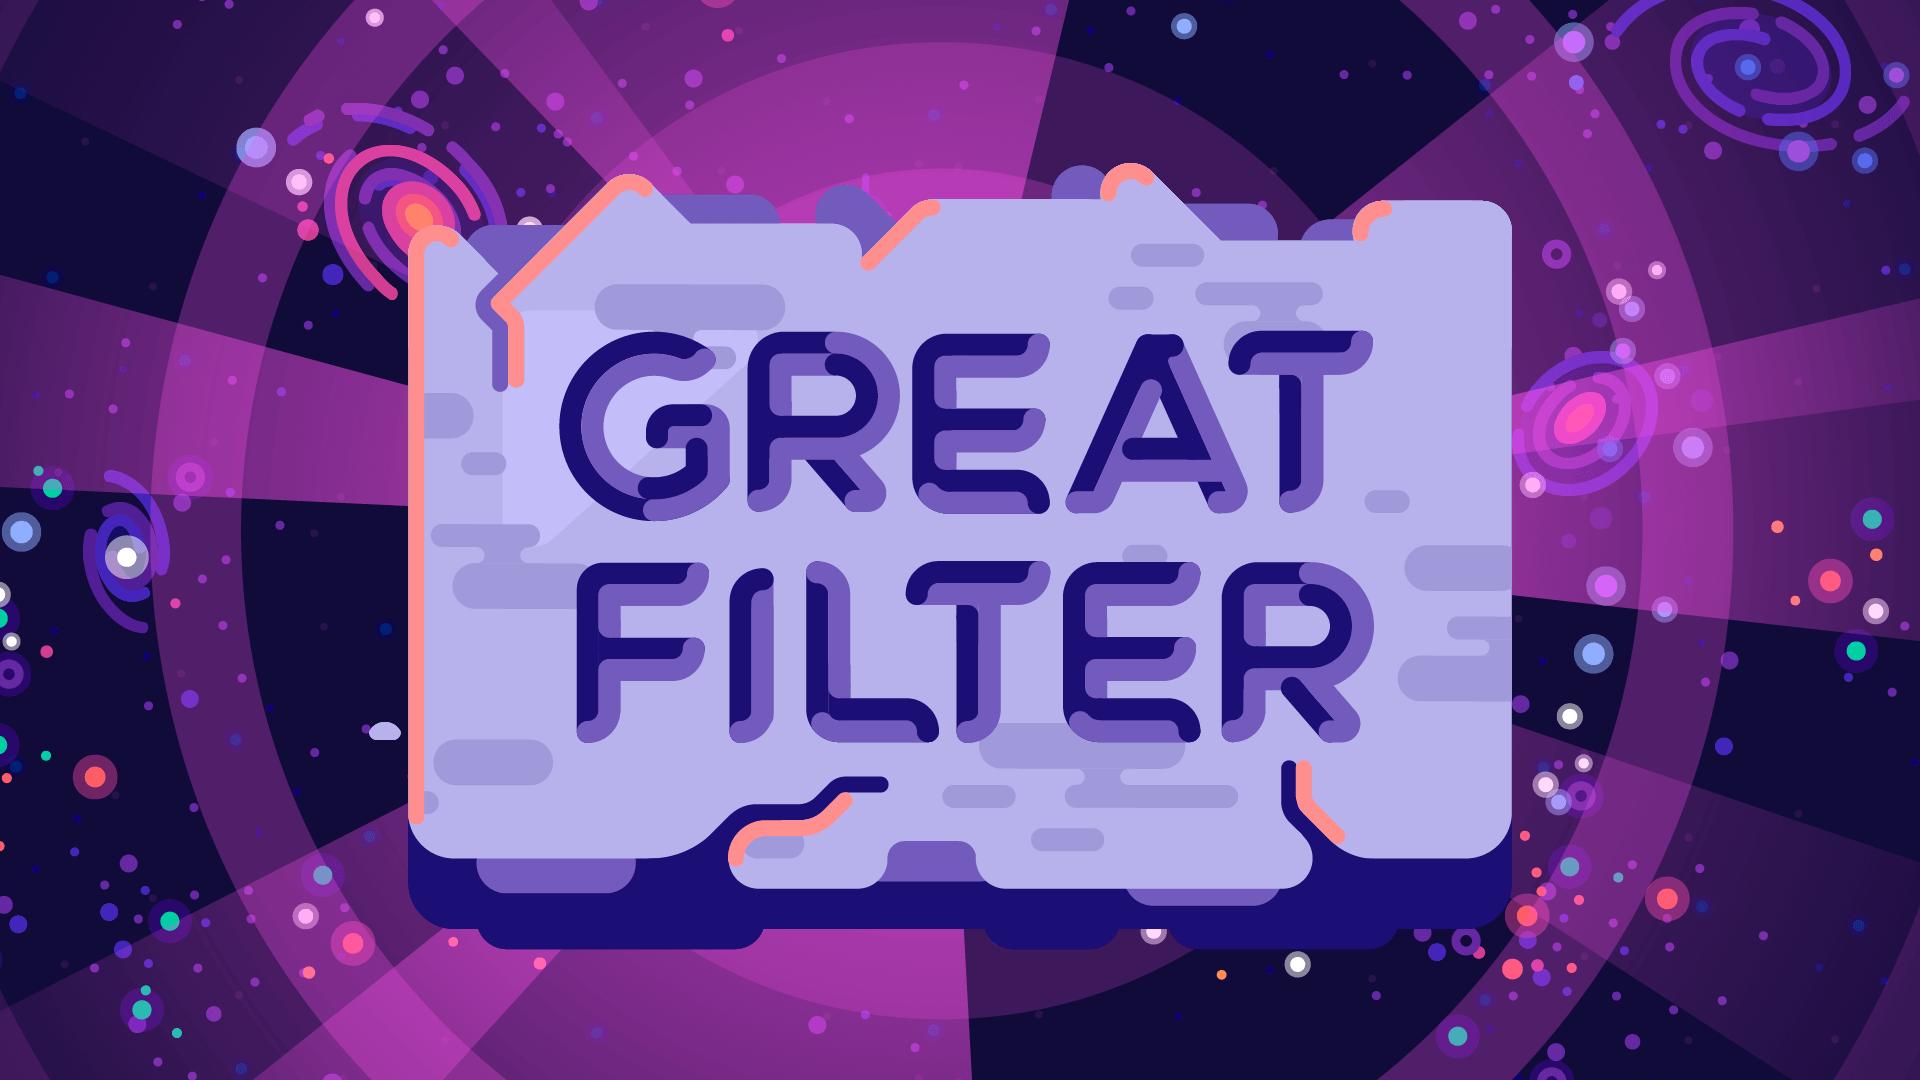 inanutshell-kurzgesagt-the-great-filter-04